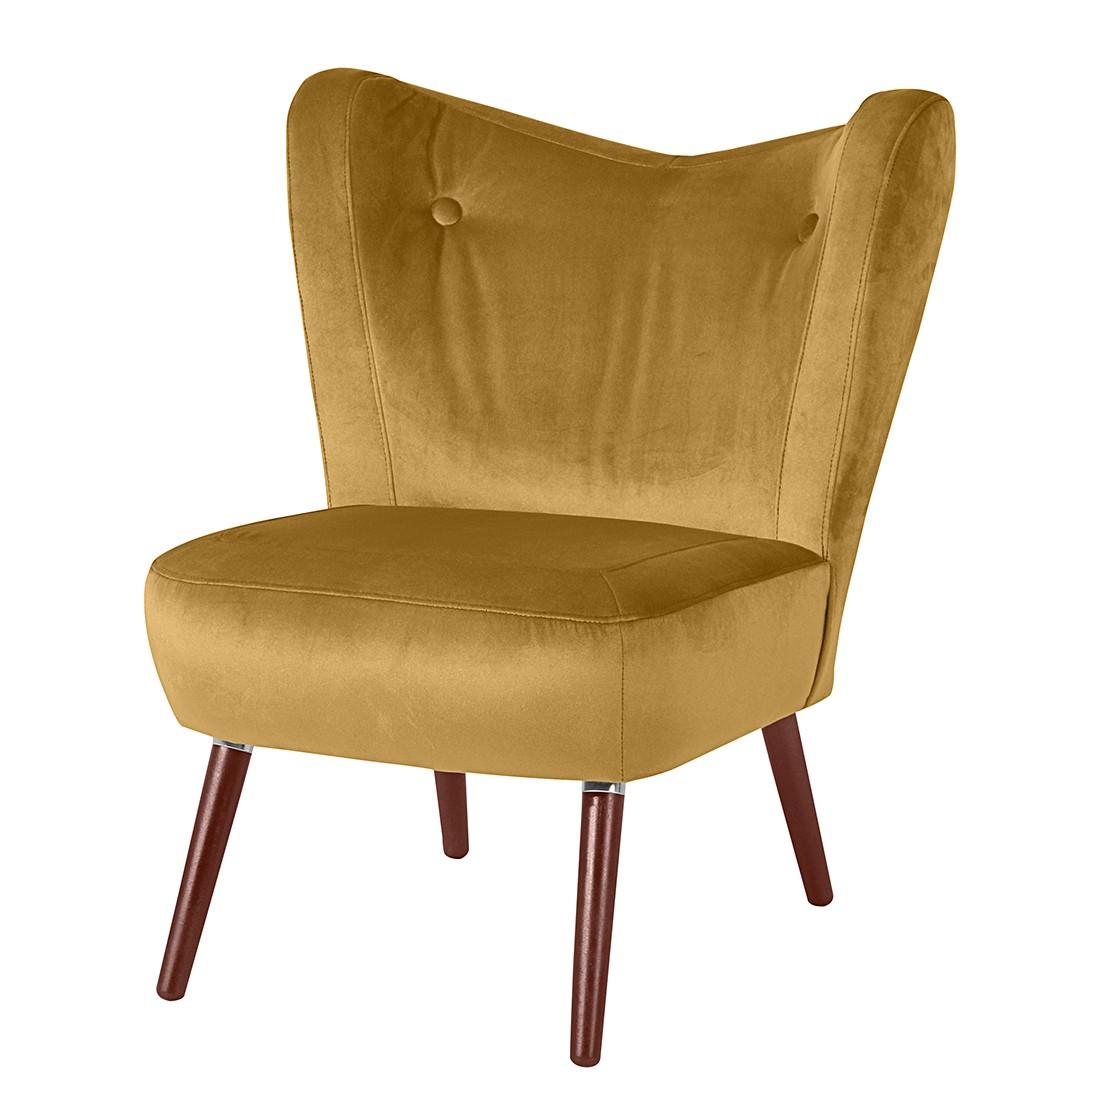 sessel celso samt maisgelb max winzer m mw 03 00446. Black Bedroom Furniture Sets. Home Design Ideas